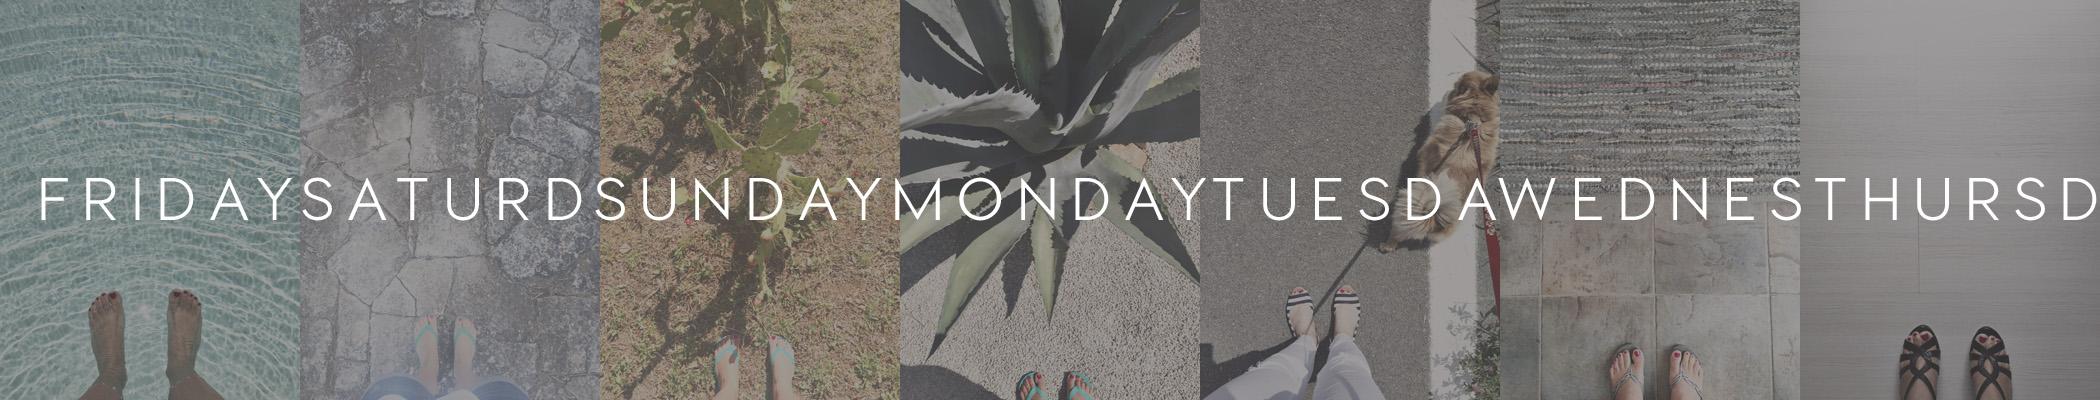 7days week